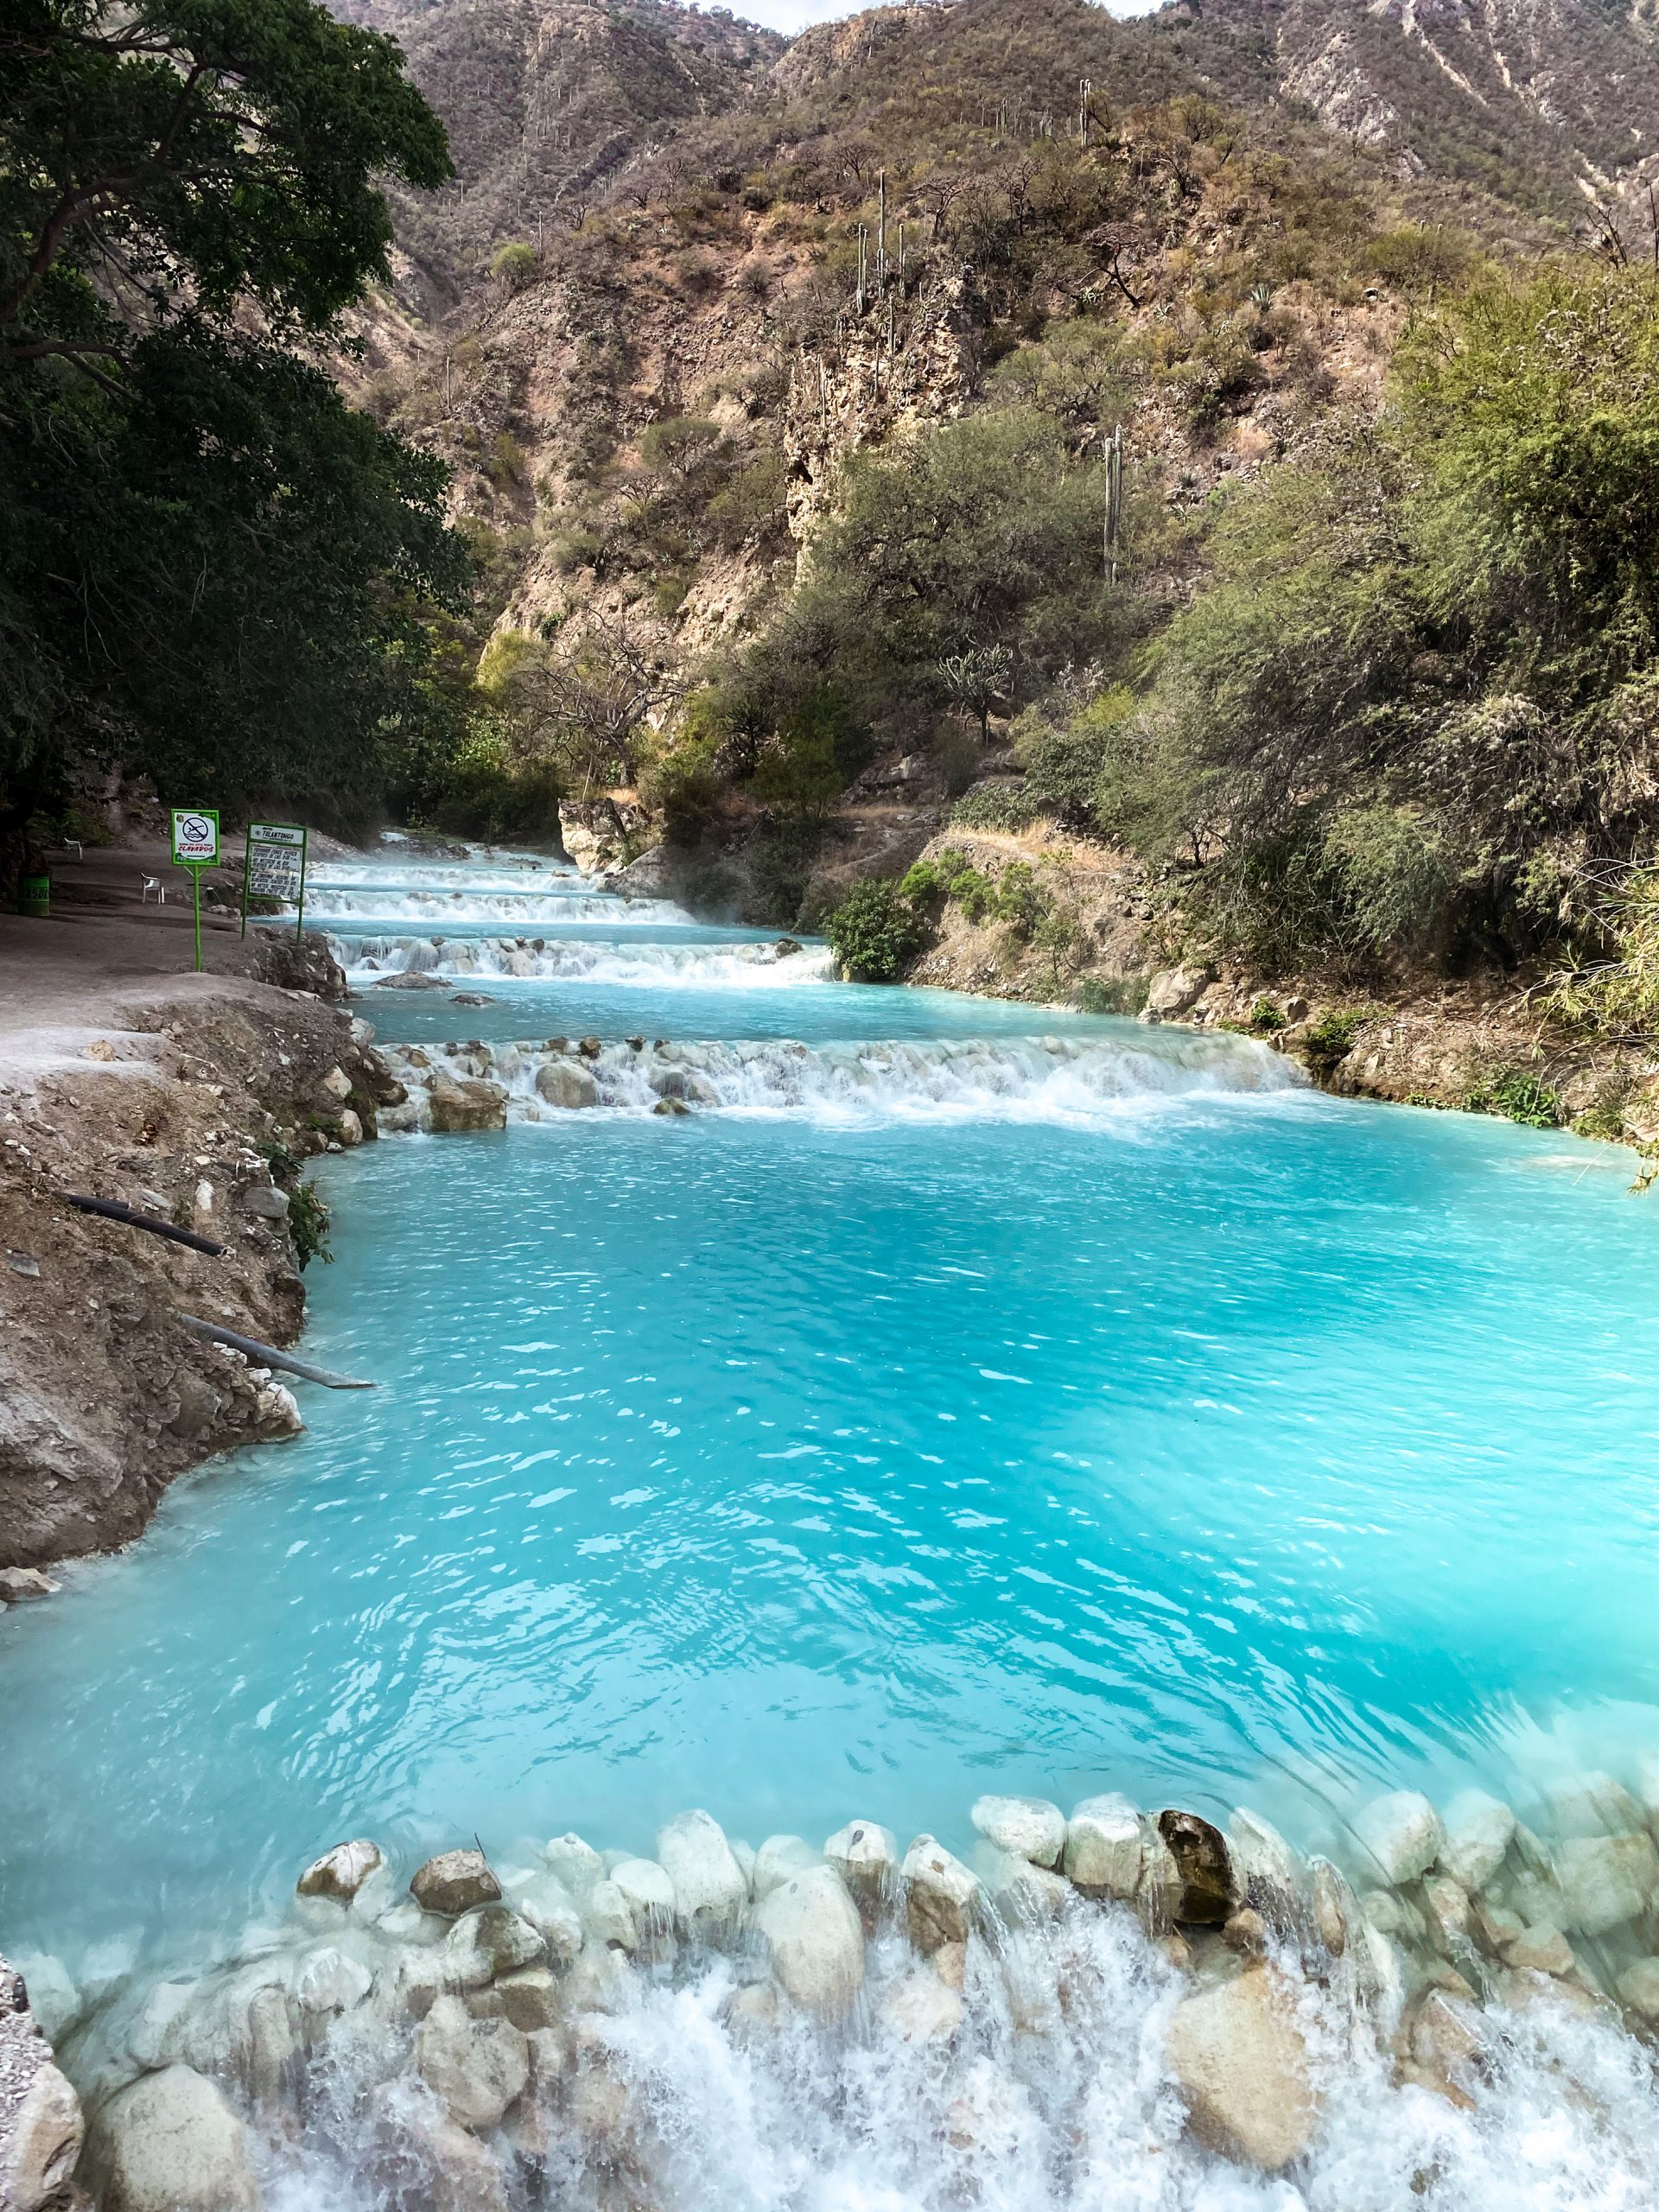 tolantongo river hidalgo mexico turquoise blue water cascades